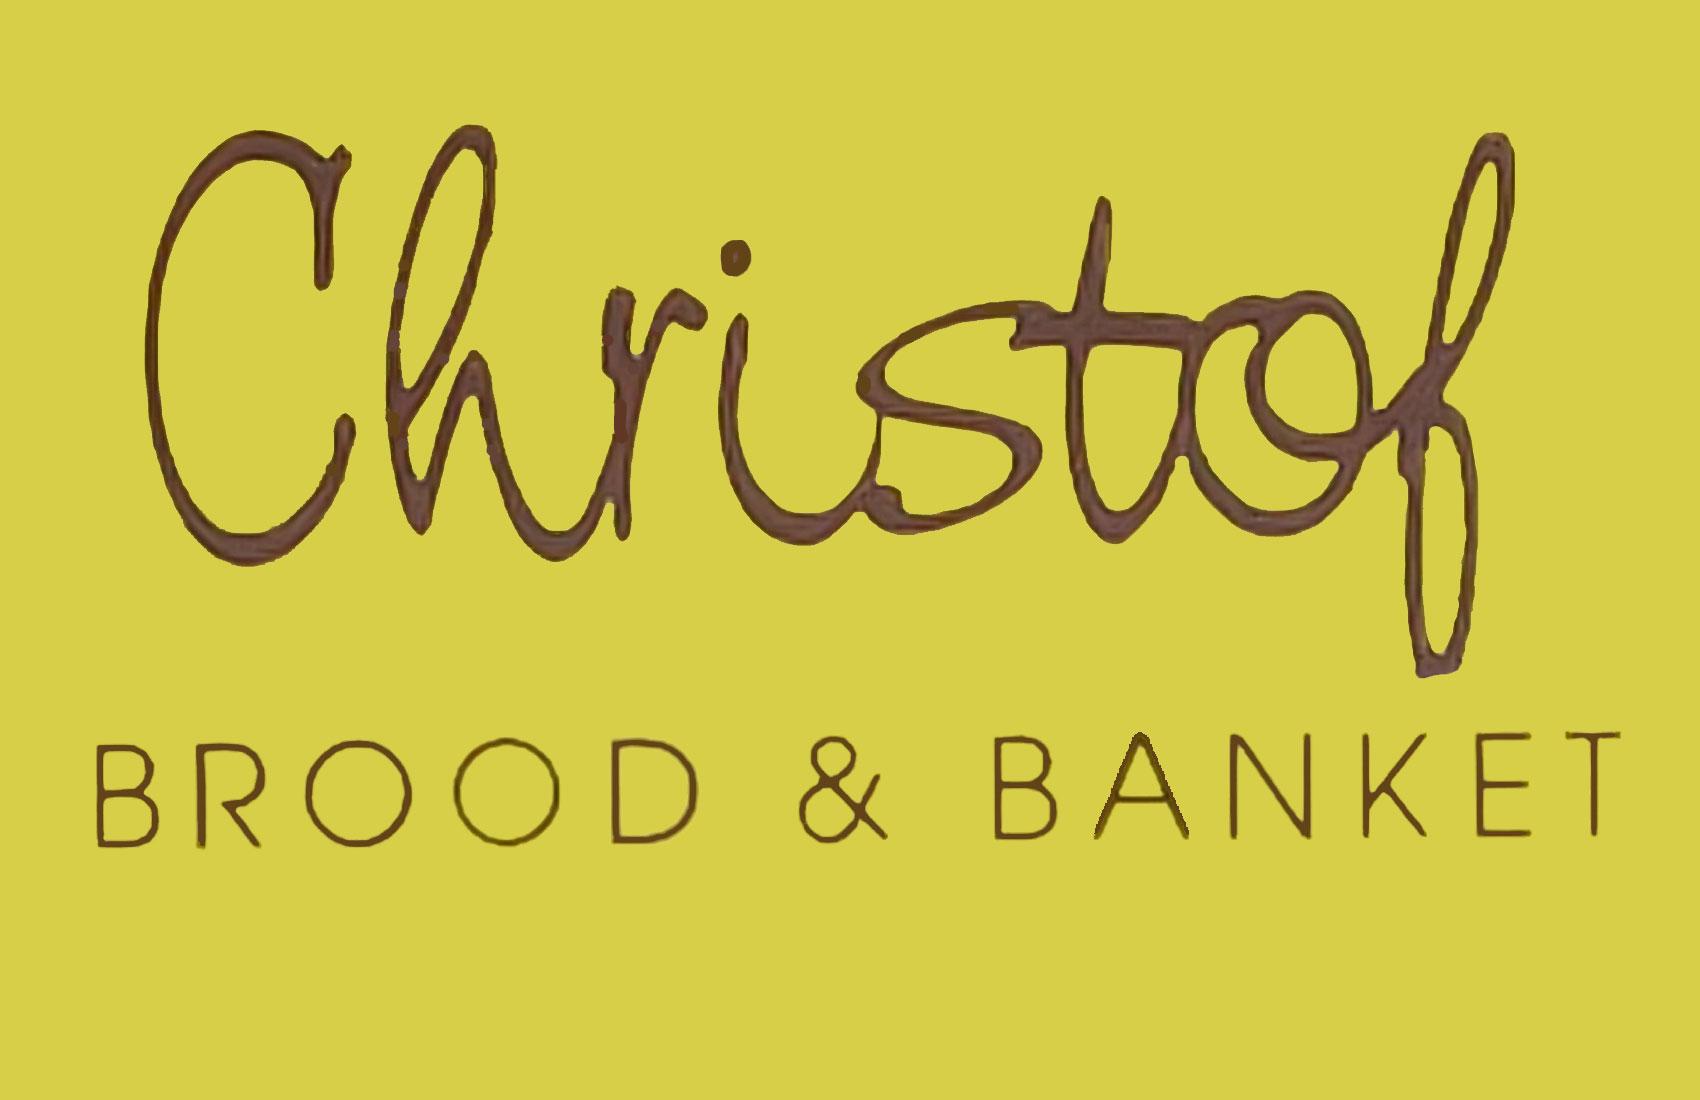 Christof Brood & banket